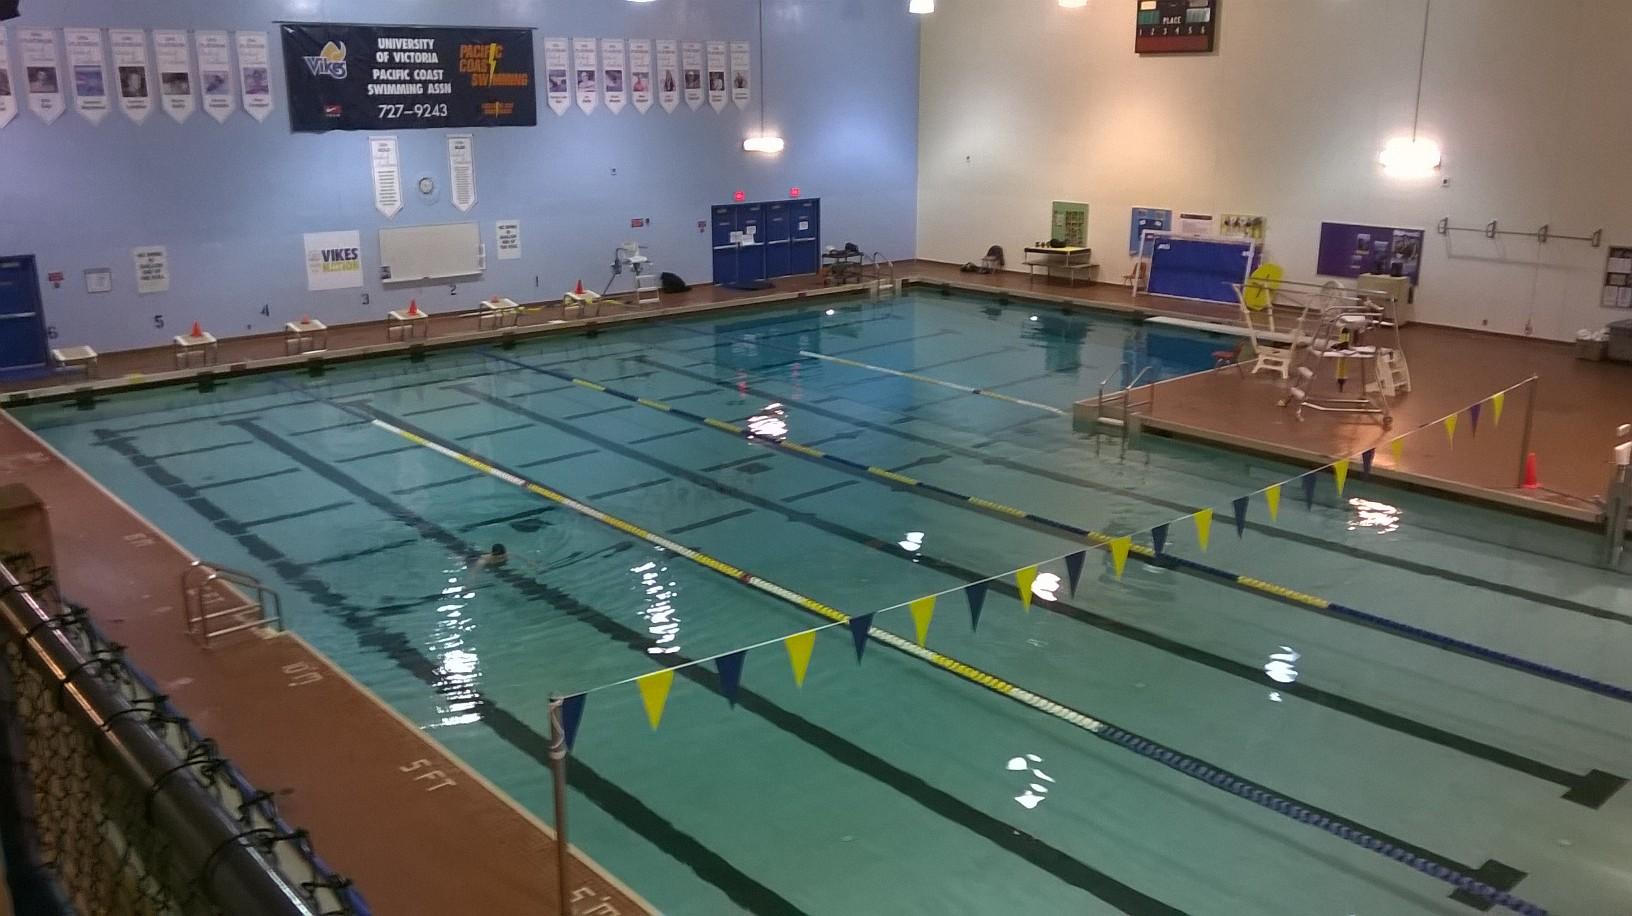 0191 - U Victoria McKinnon Building Pool